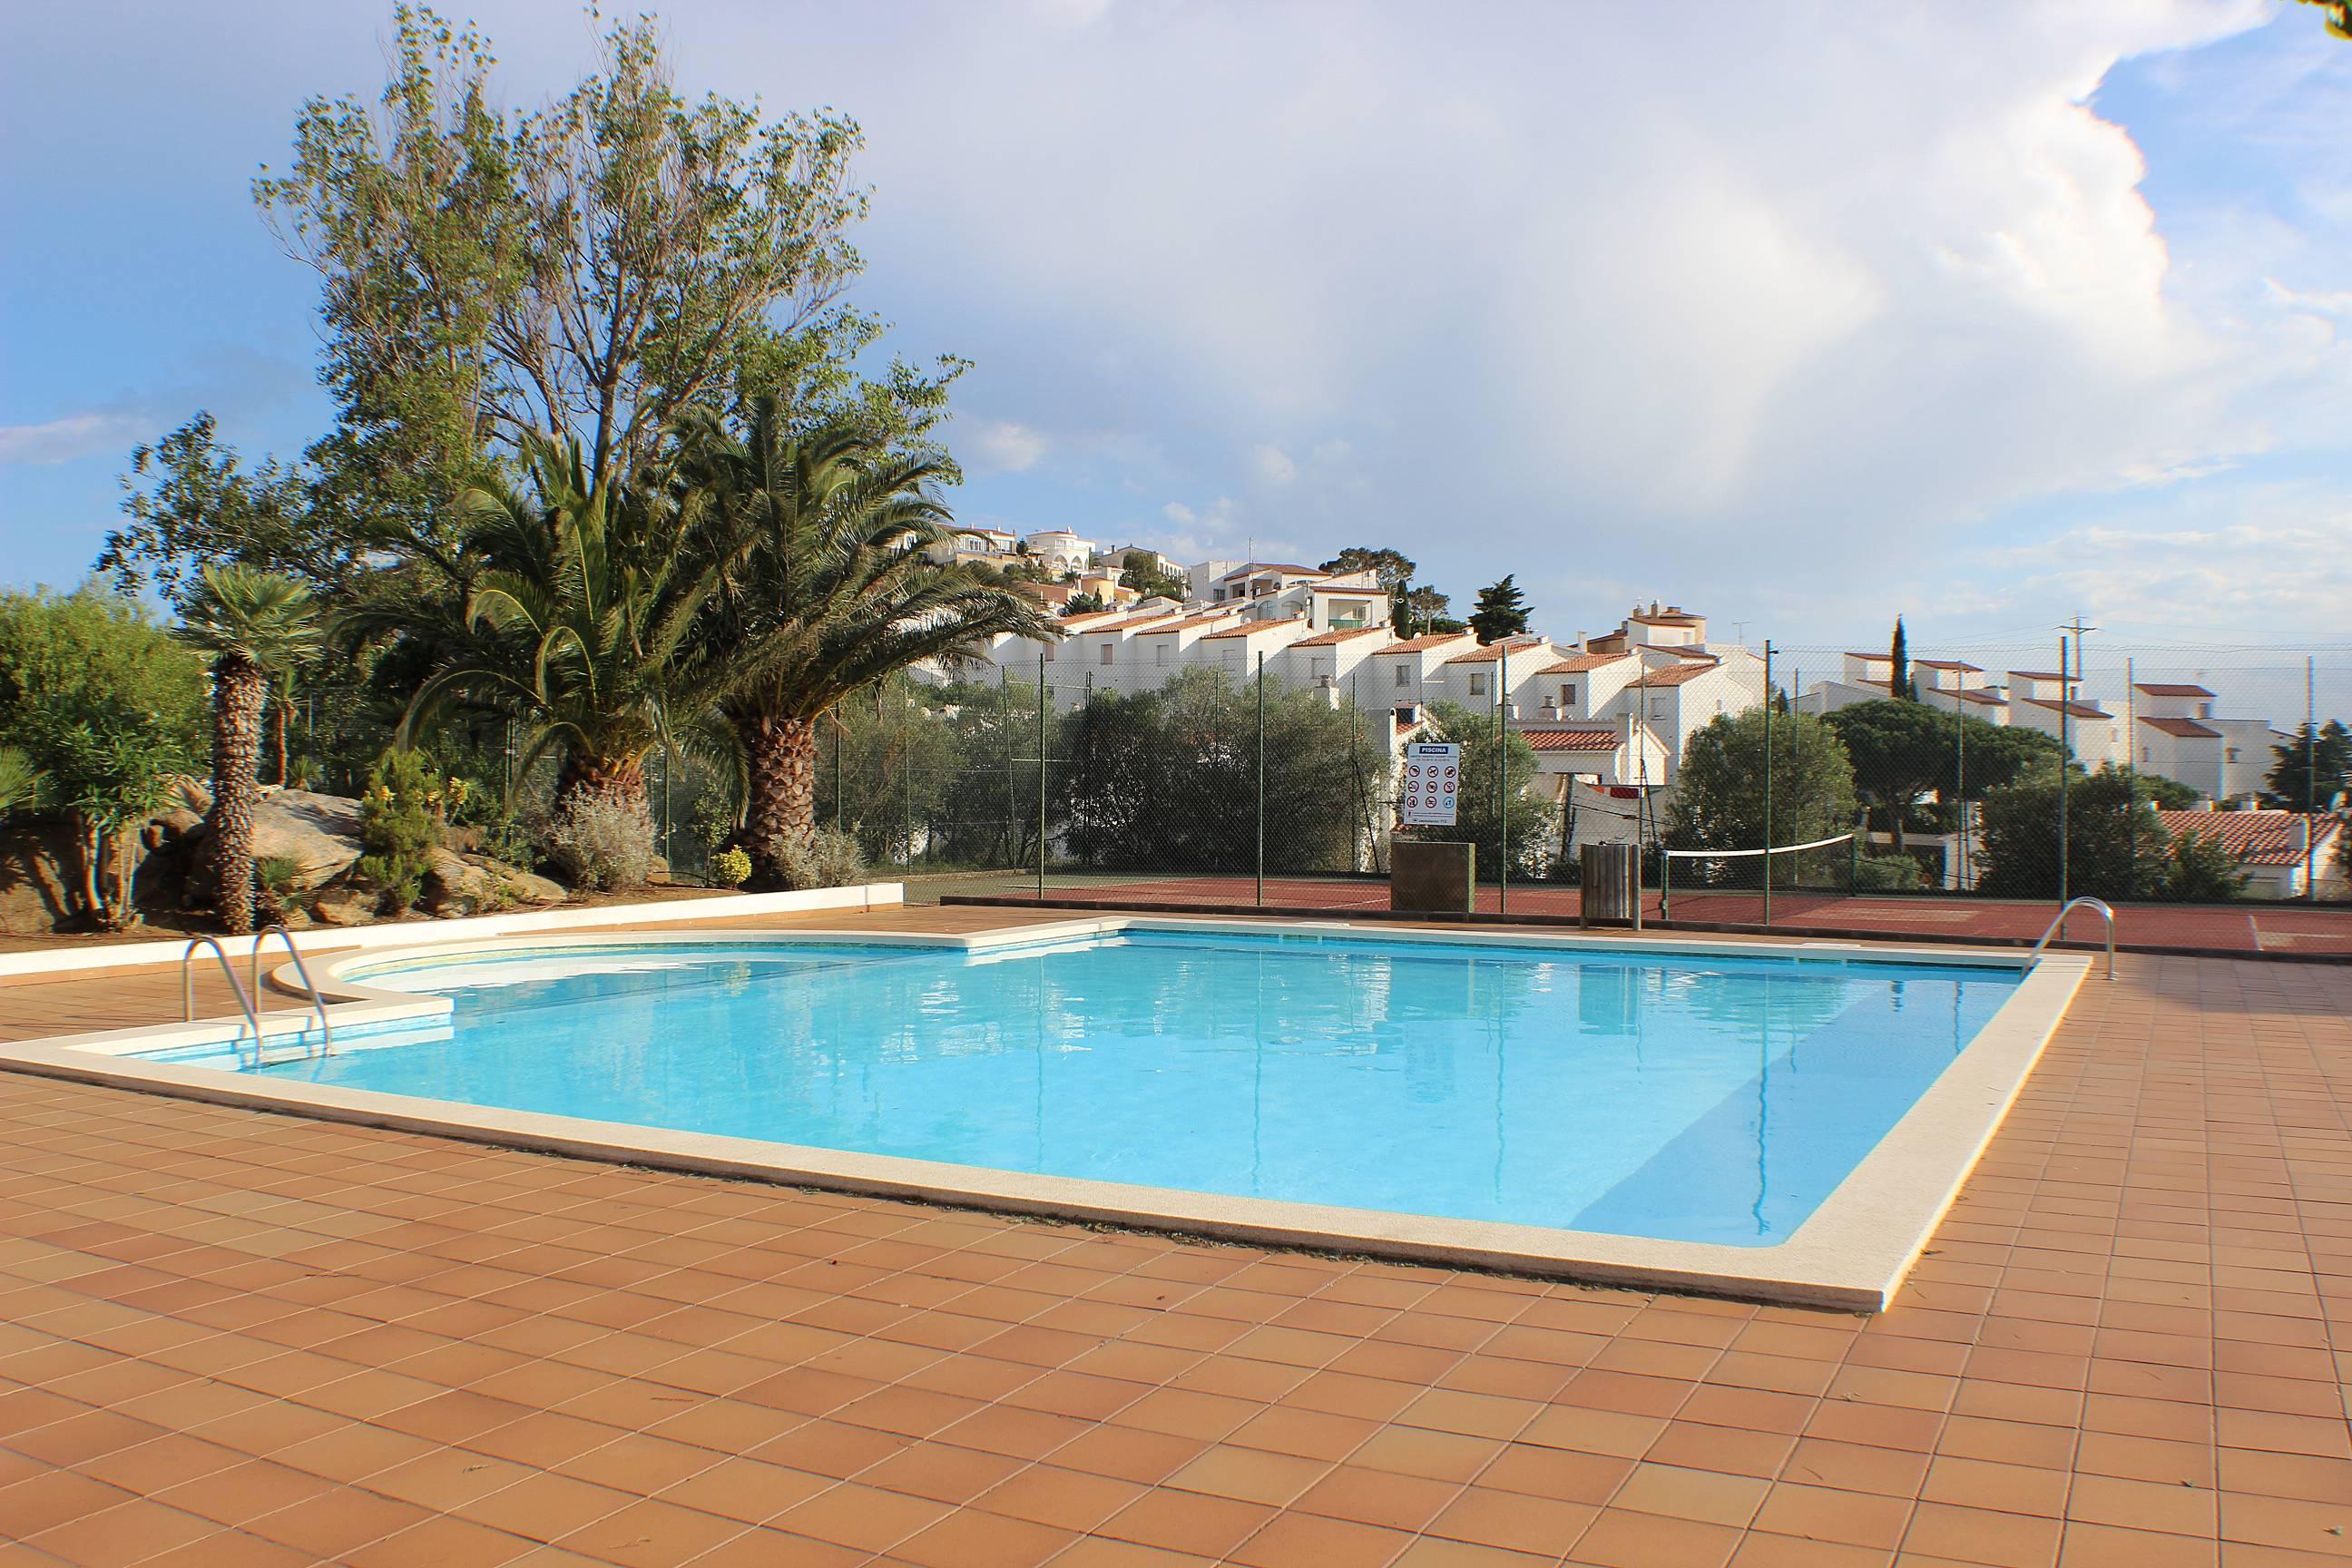 Coronas 28 para 6 personas piscina comunitaria roses for Piscina roses